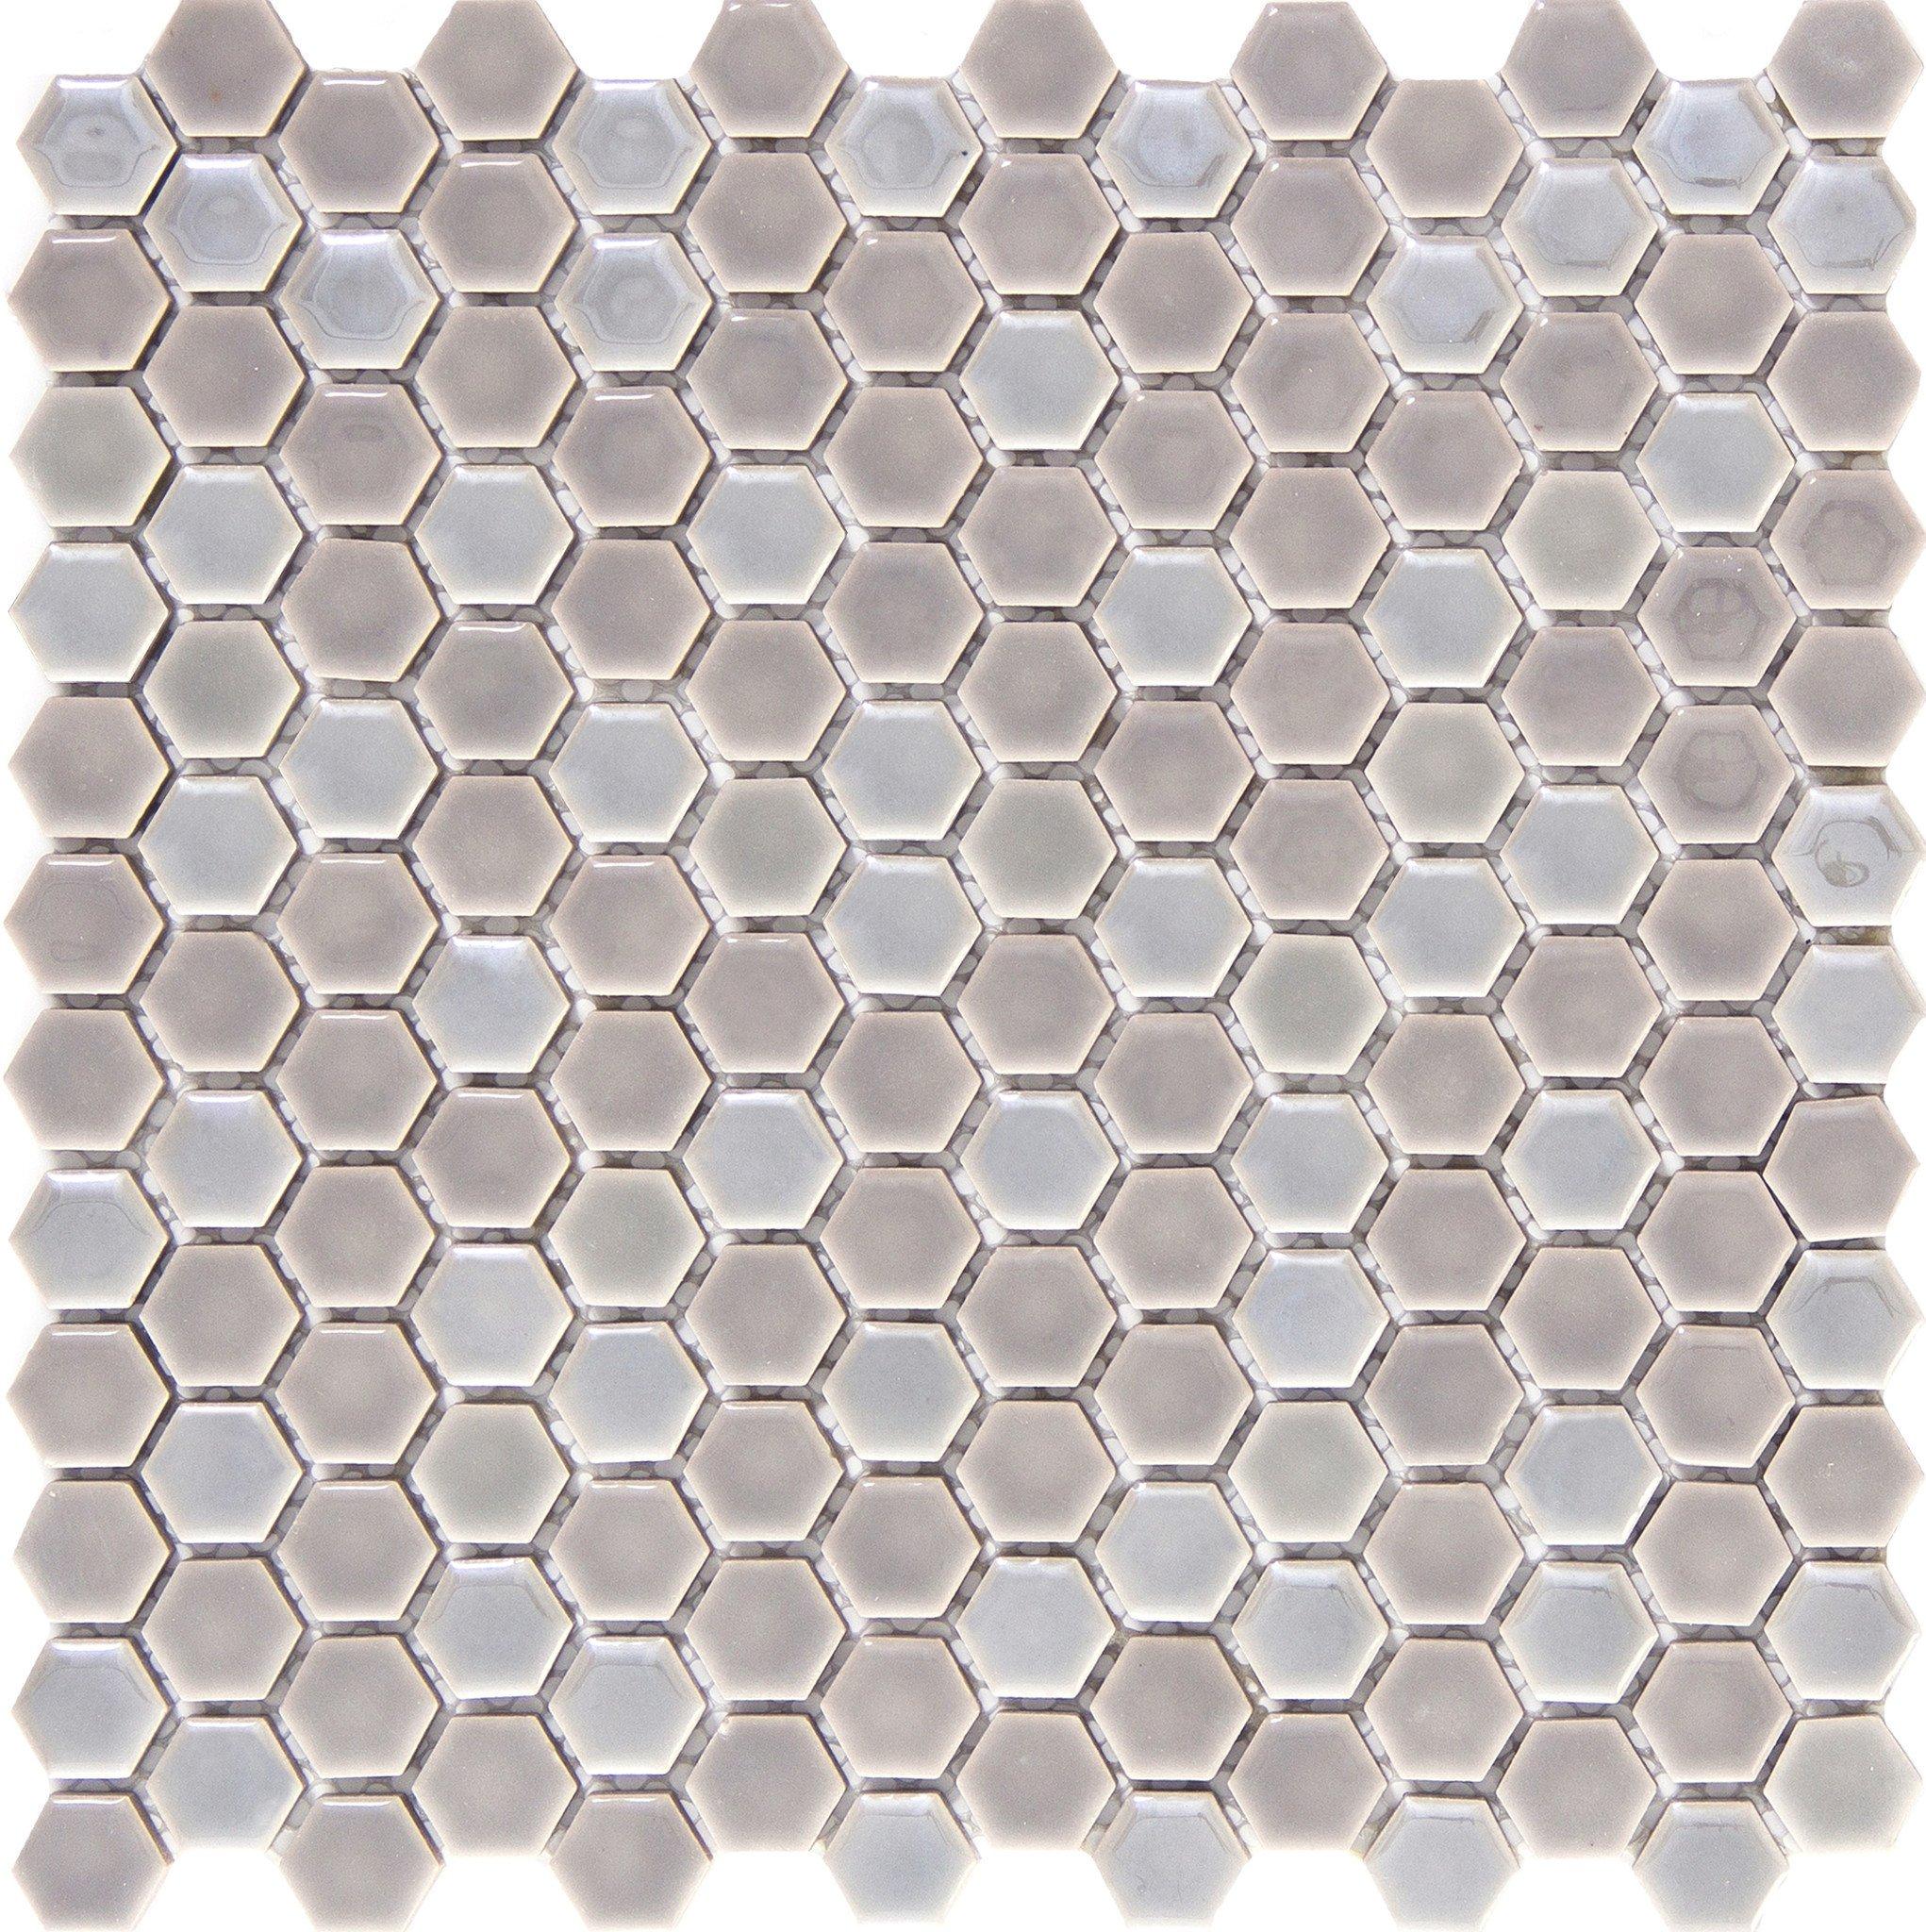 Confetti 12 Ceramic Mosaic Tile Mosaic Wall Tiles Mosaic Tiles